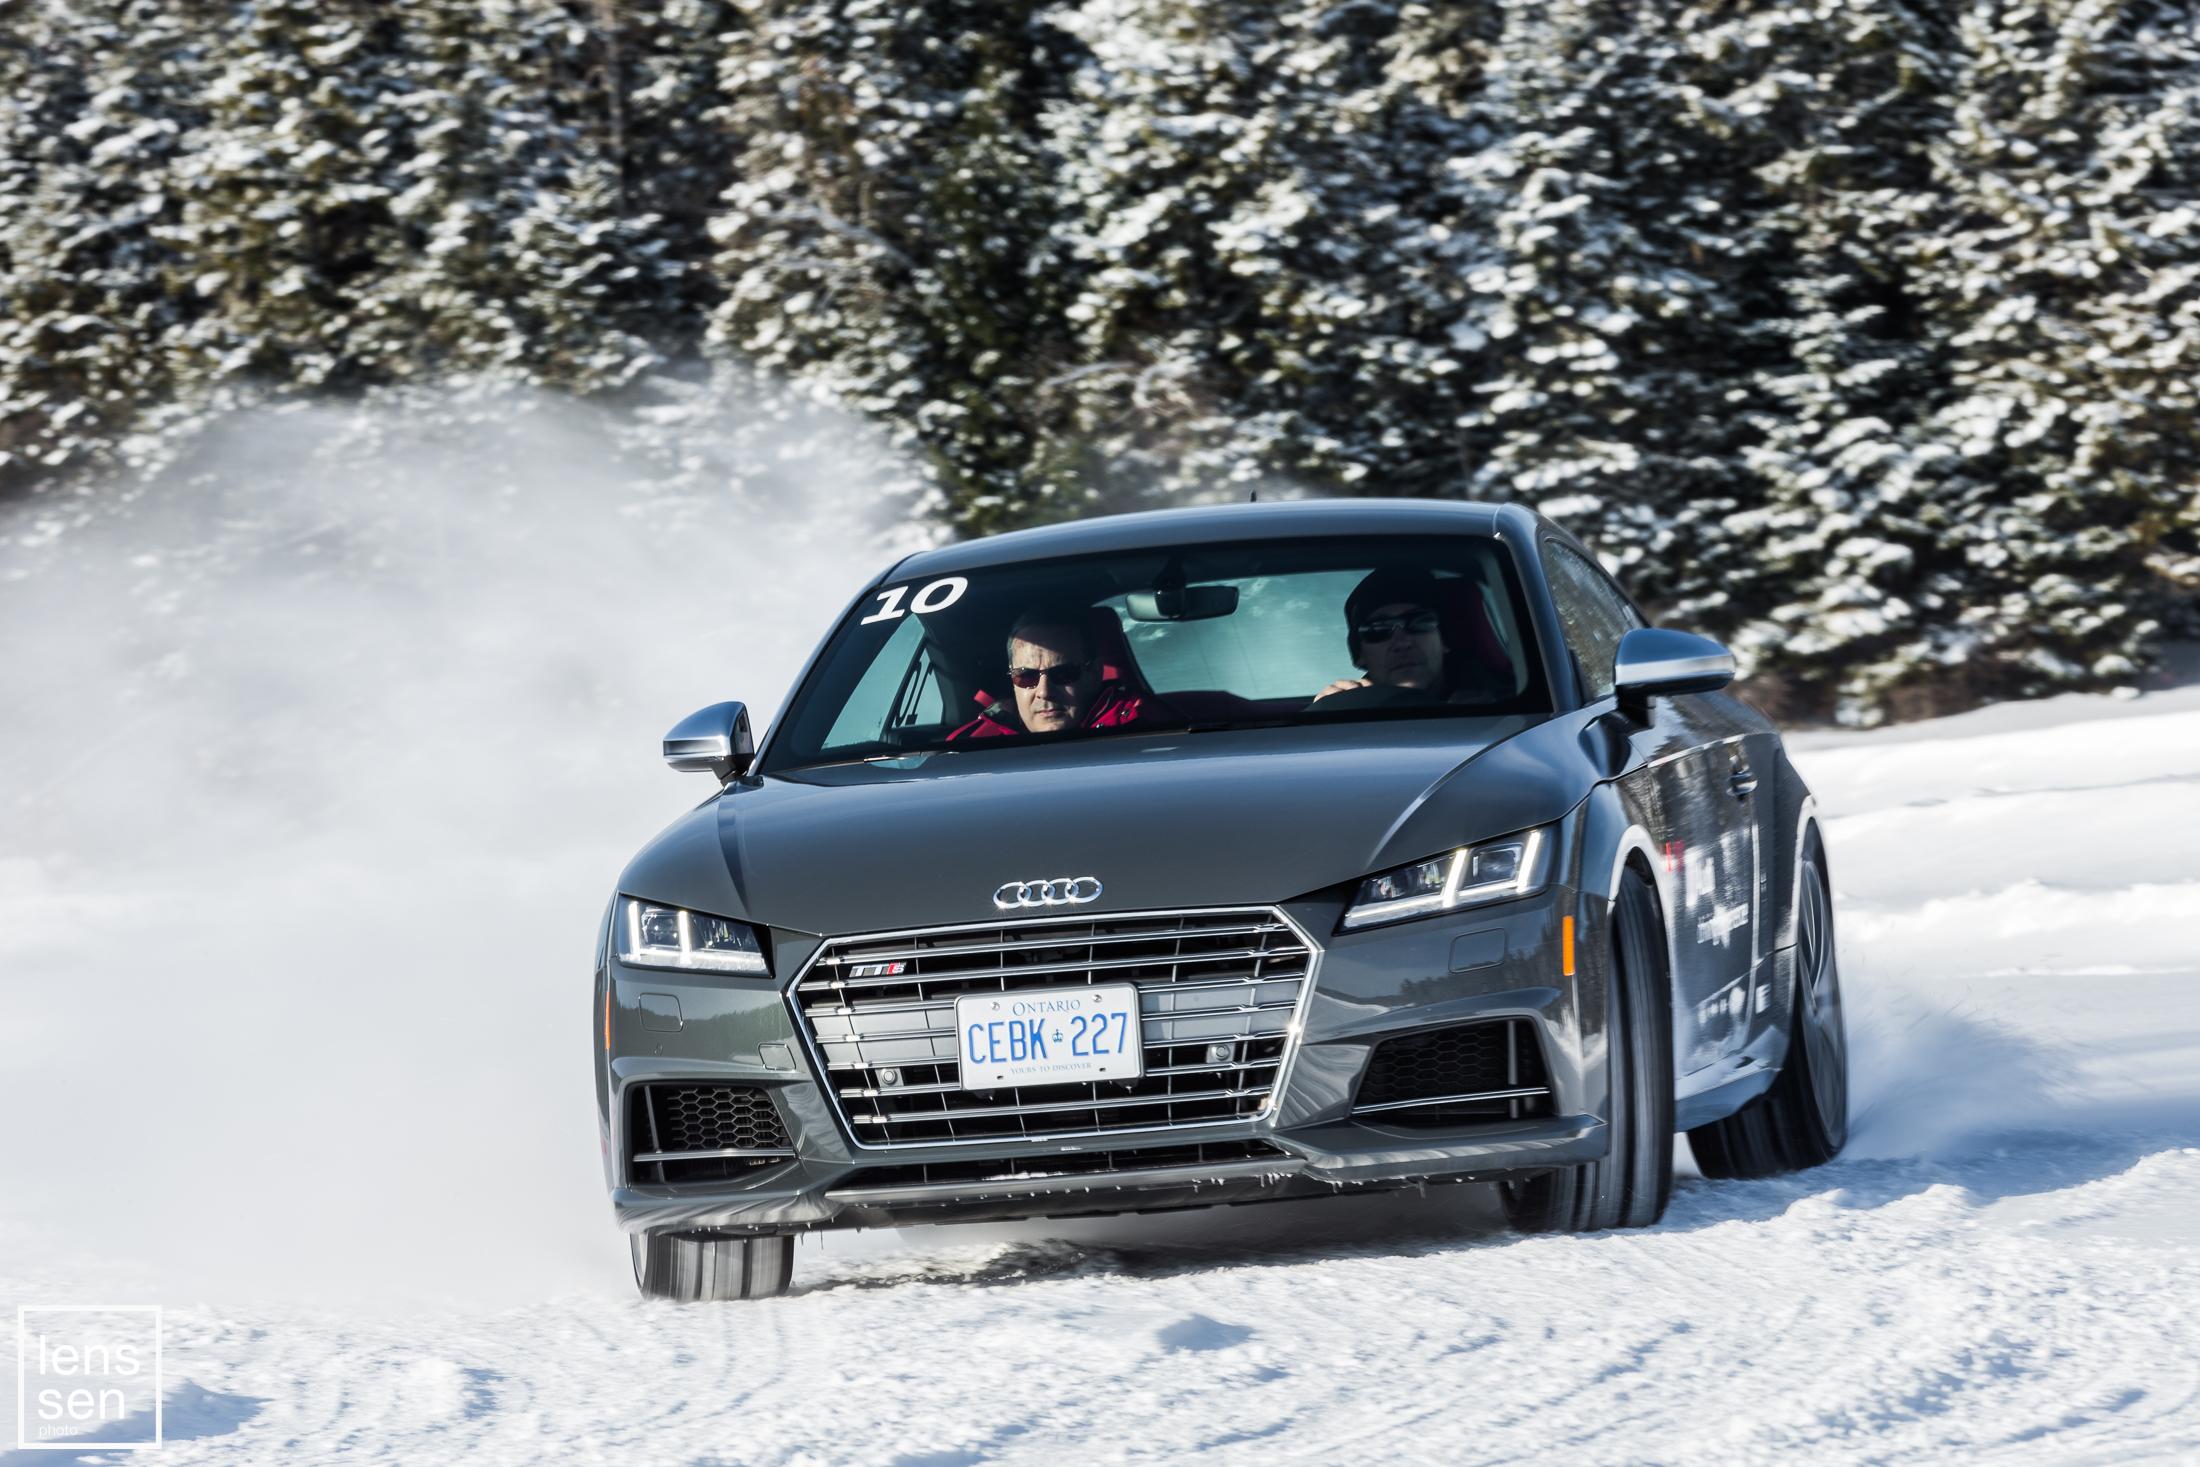 Audi Ice Experience - Sacacomie QC - Feb 2018 - 26 -1431.jpg